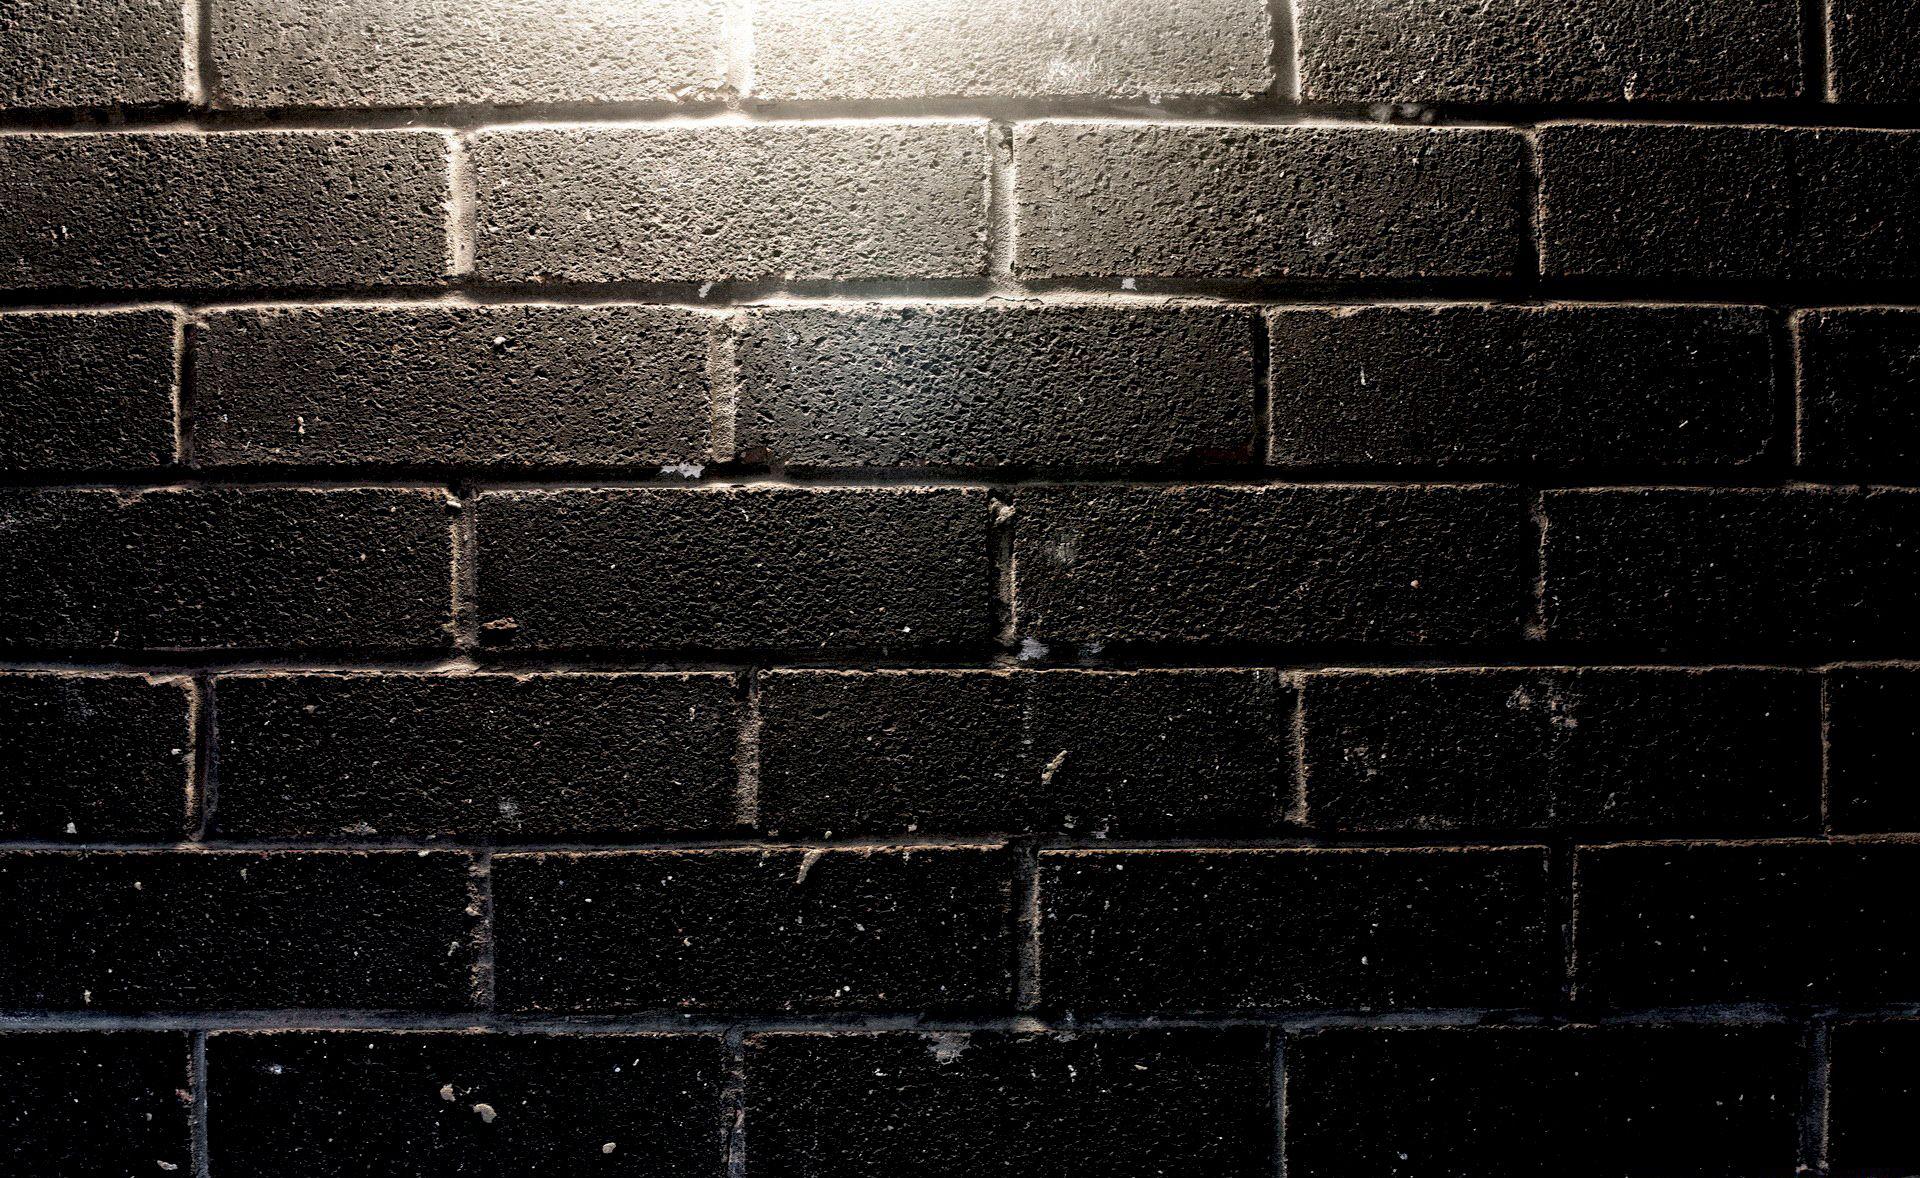 Black Brick Wall Background Hd 1920x1178 Wallpaper Teahub Io